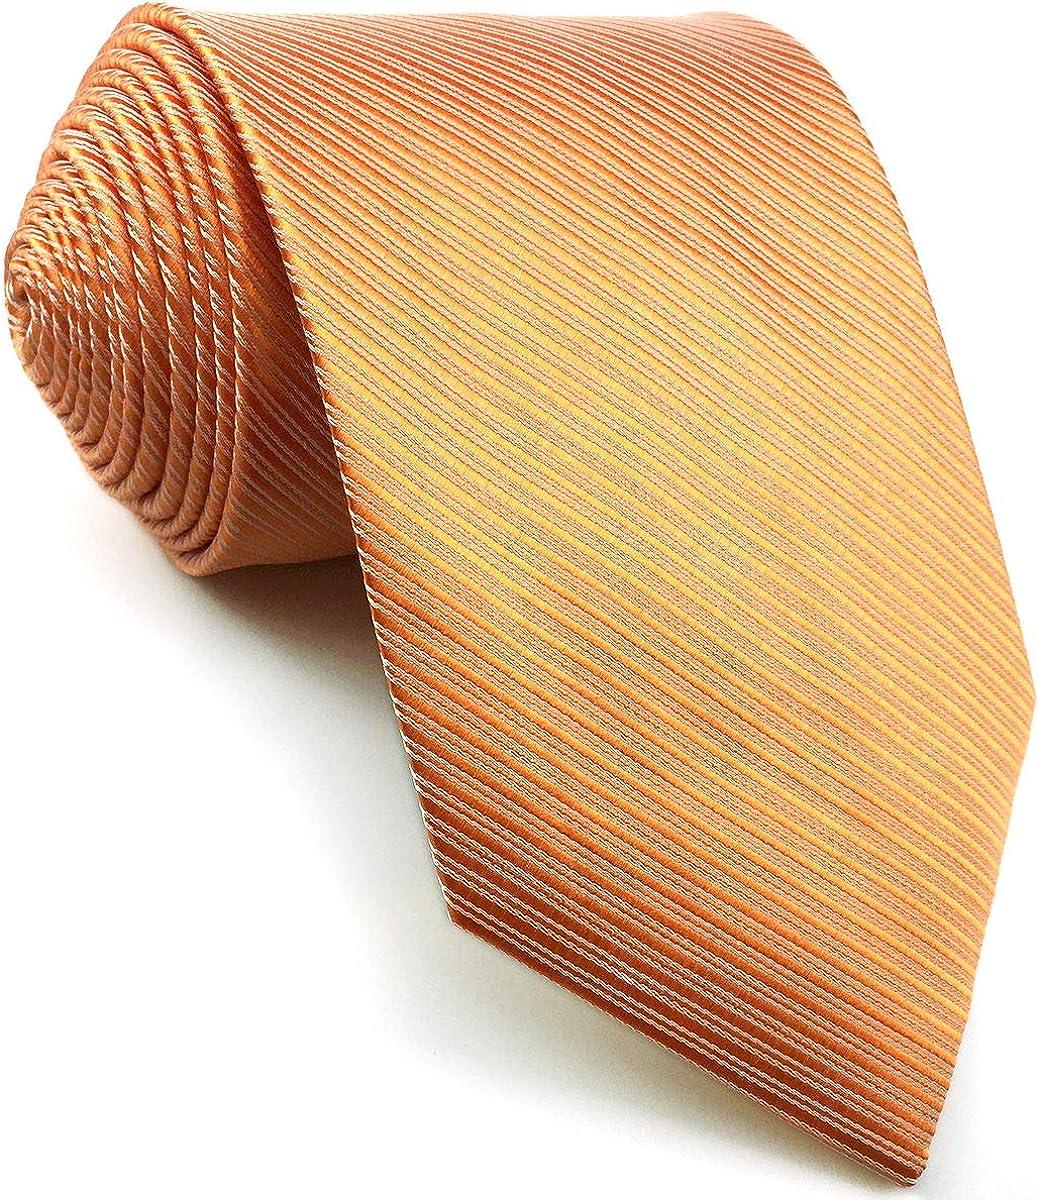 S/&W SHLAX/&WING Viola Cravatta da uomo Extra lungo Tinta Unita Set